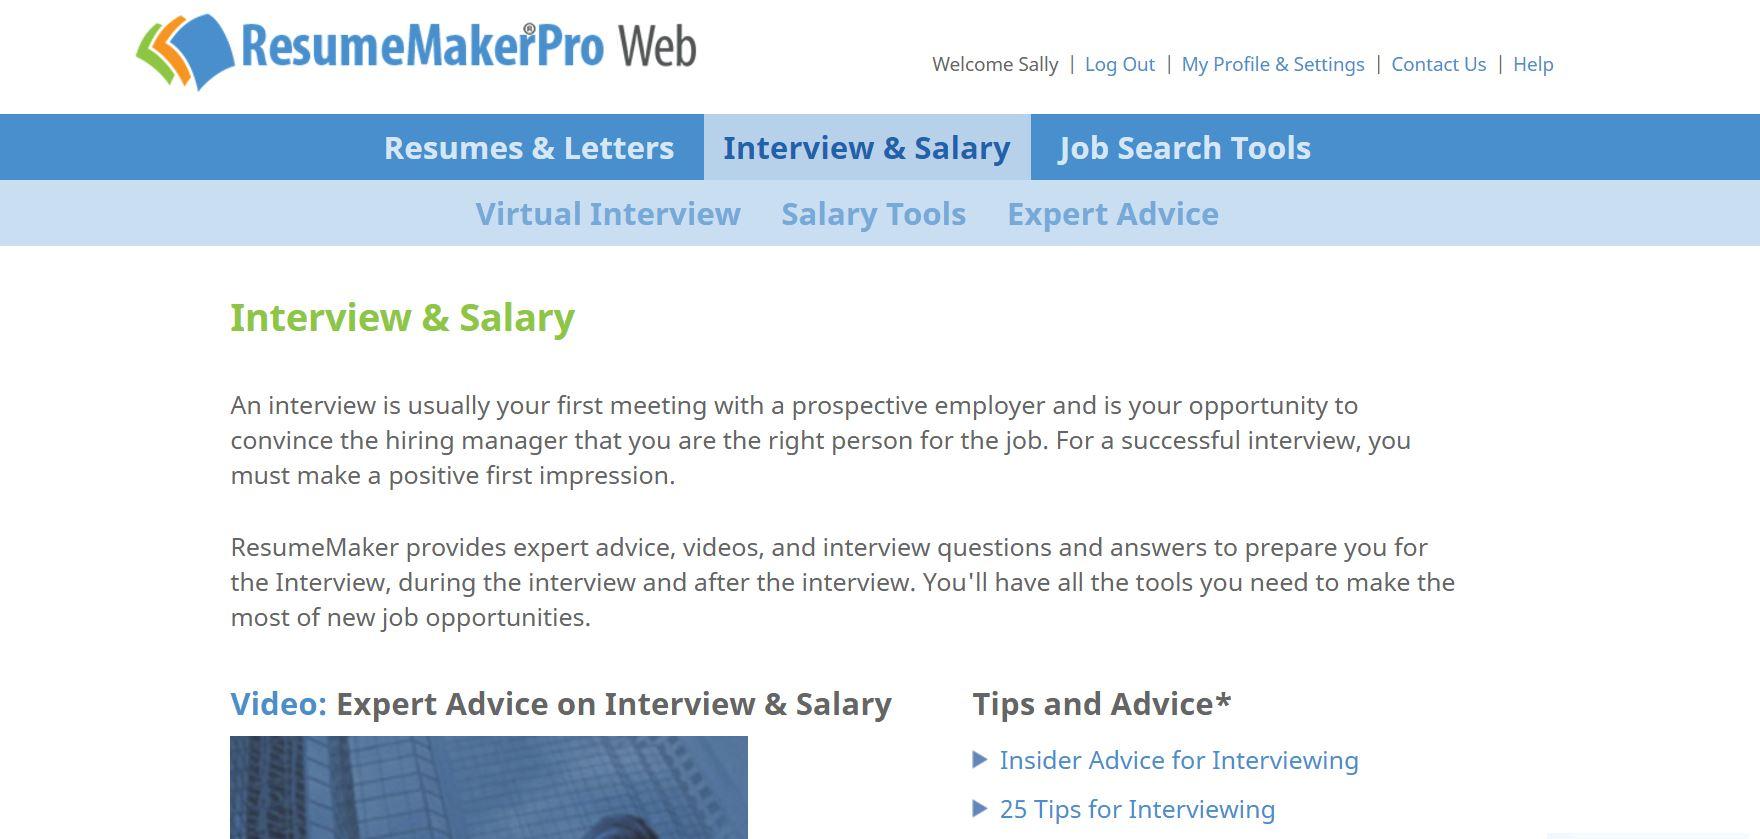 ResumeMakerPro Web - Annual Subscription Screenshot